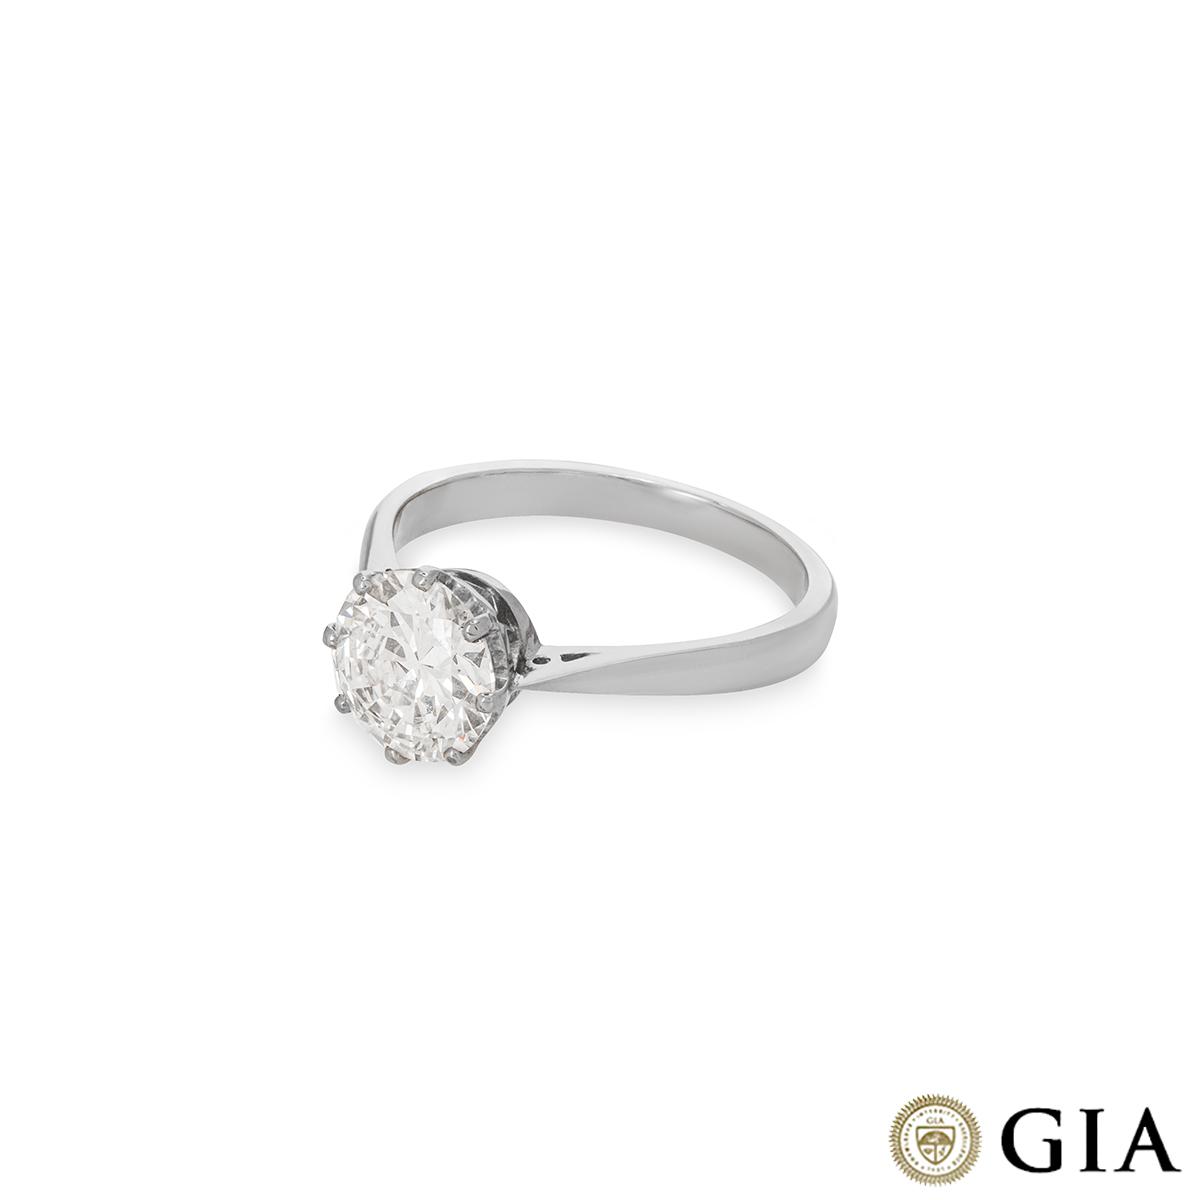 Old European Cut Platinum Diamond Ring 1.72ct E/VS1